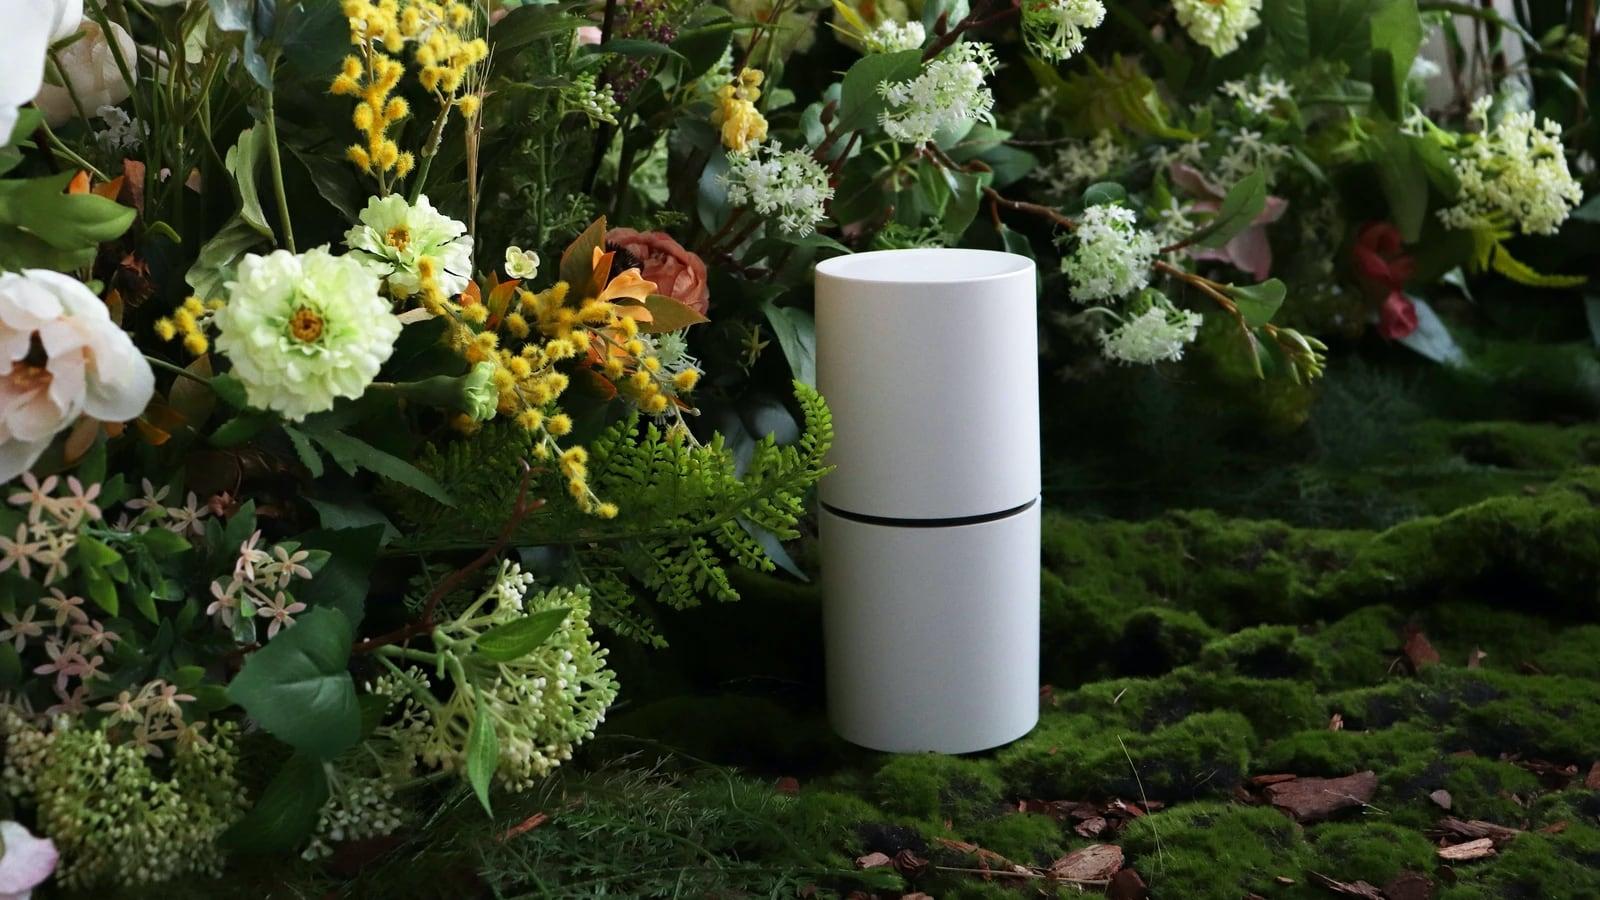 Pium Smart Diffuser enhances your mood through the power of scent